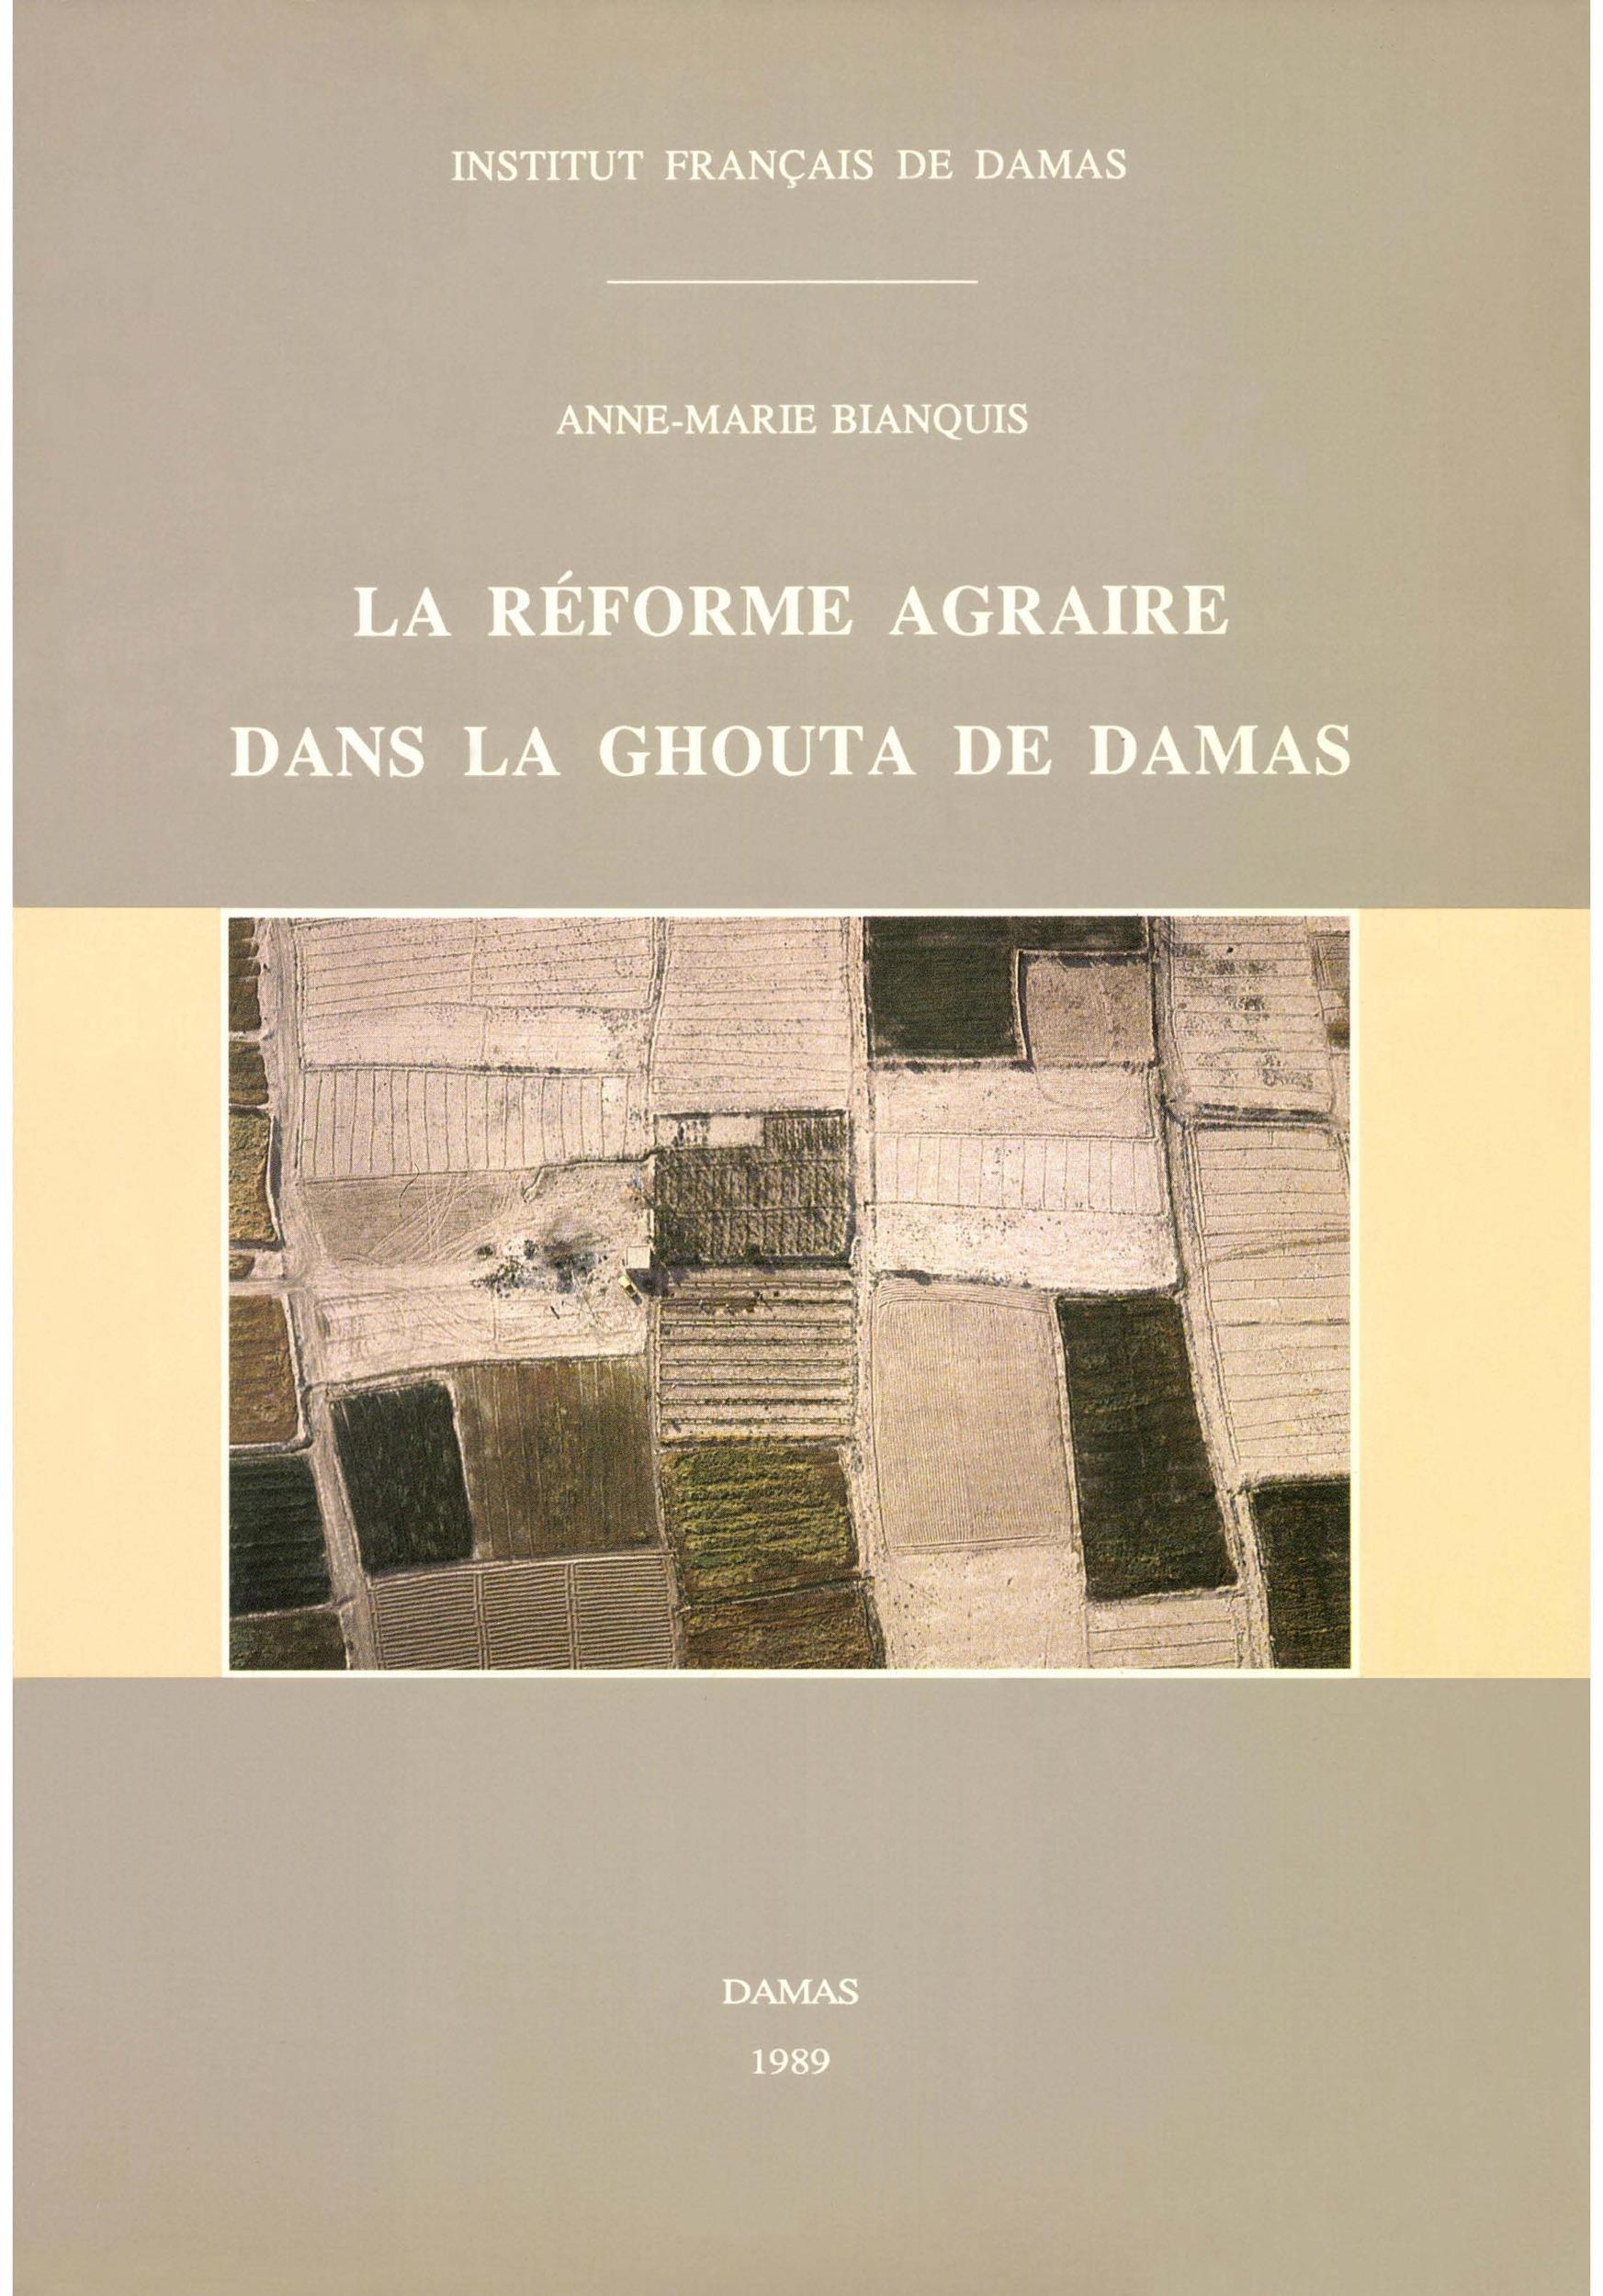 La reforme agraire dans la ghouta de damas